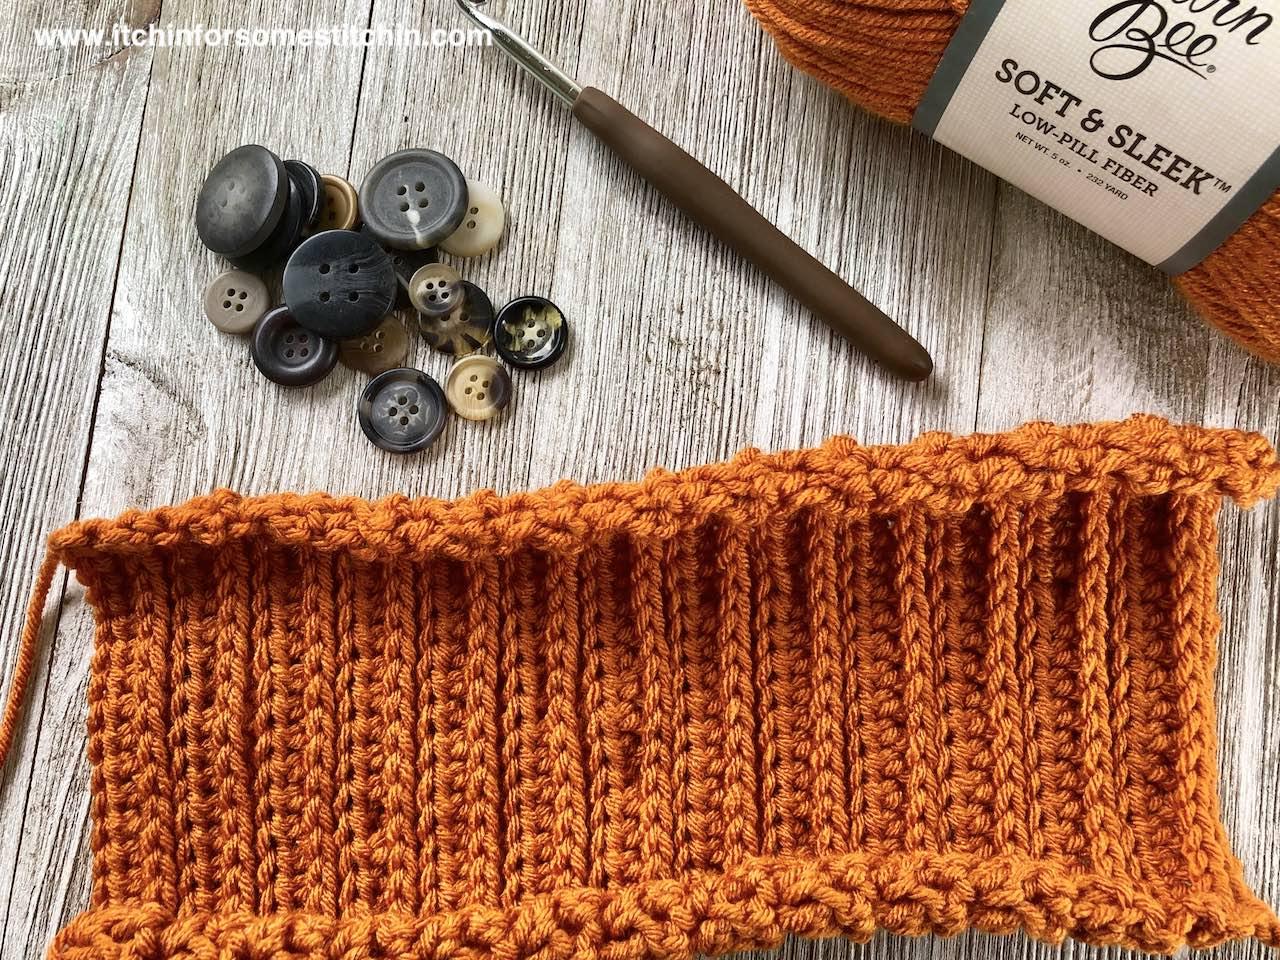 Crochet Pumpkin Baby Hat in progress by www.itchinforsomestitchin.com